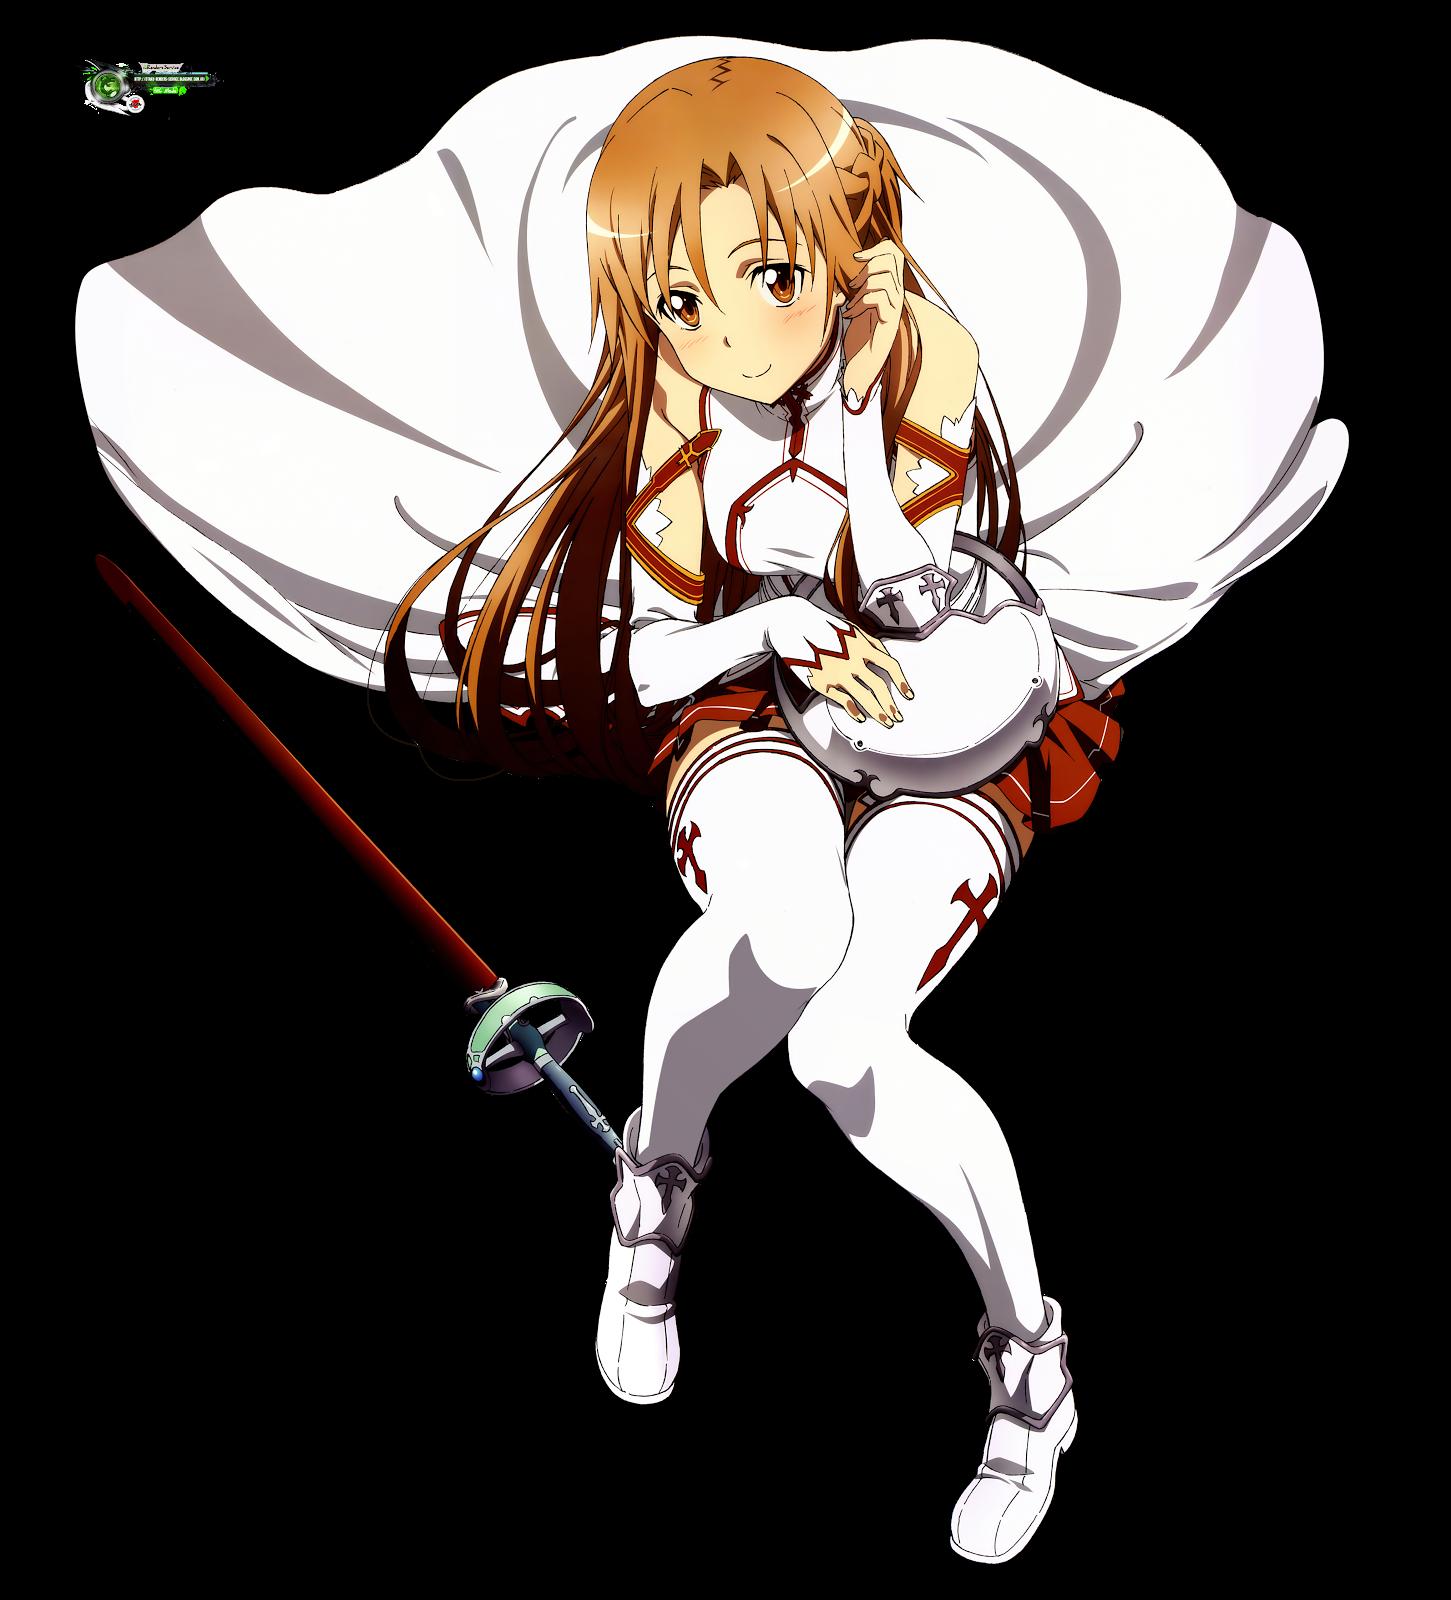 Sword Art Online:Asuna Yuuki Hyper Cute Soldier Render V1